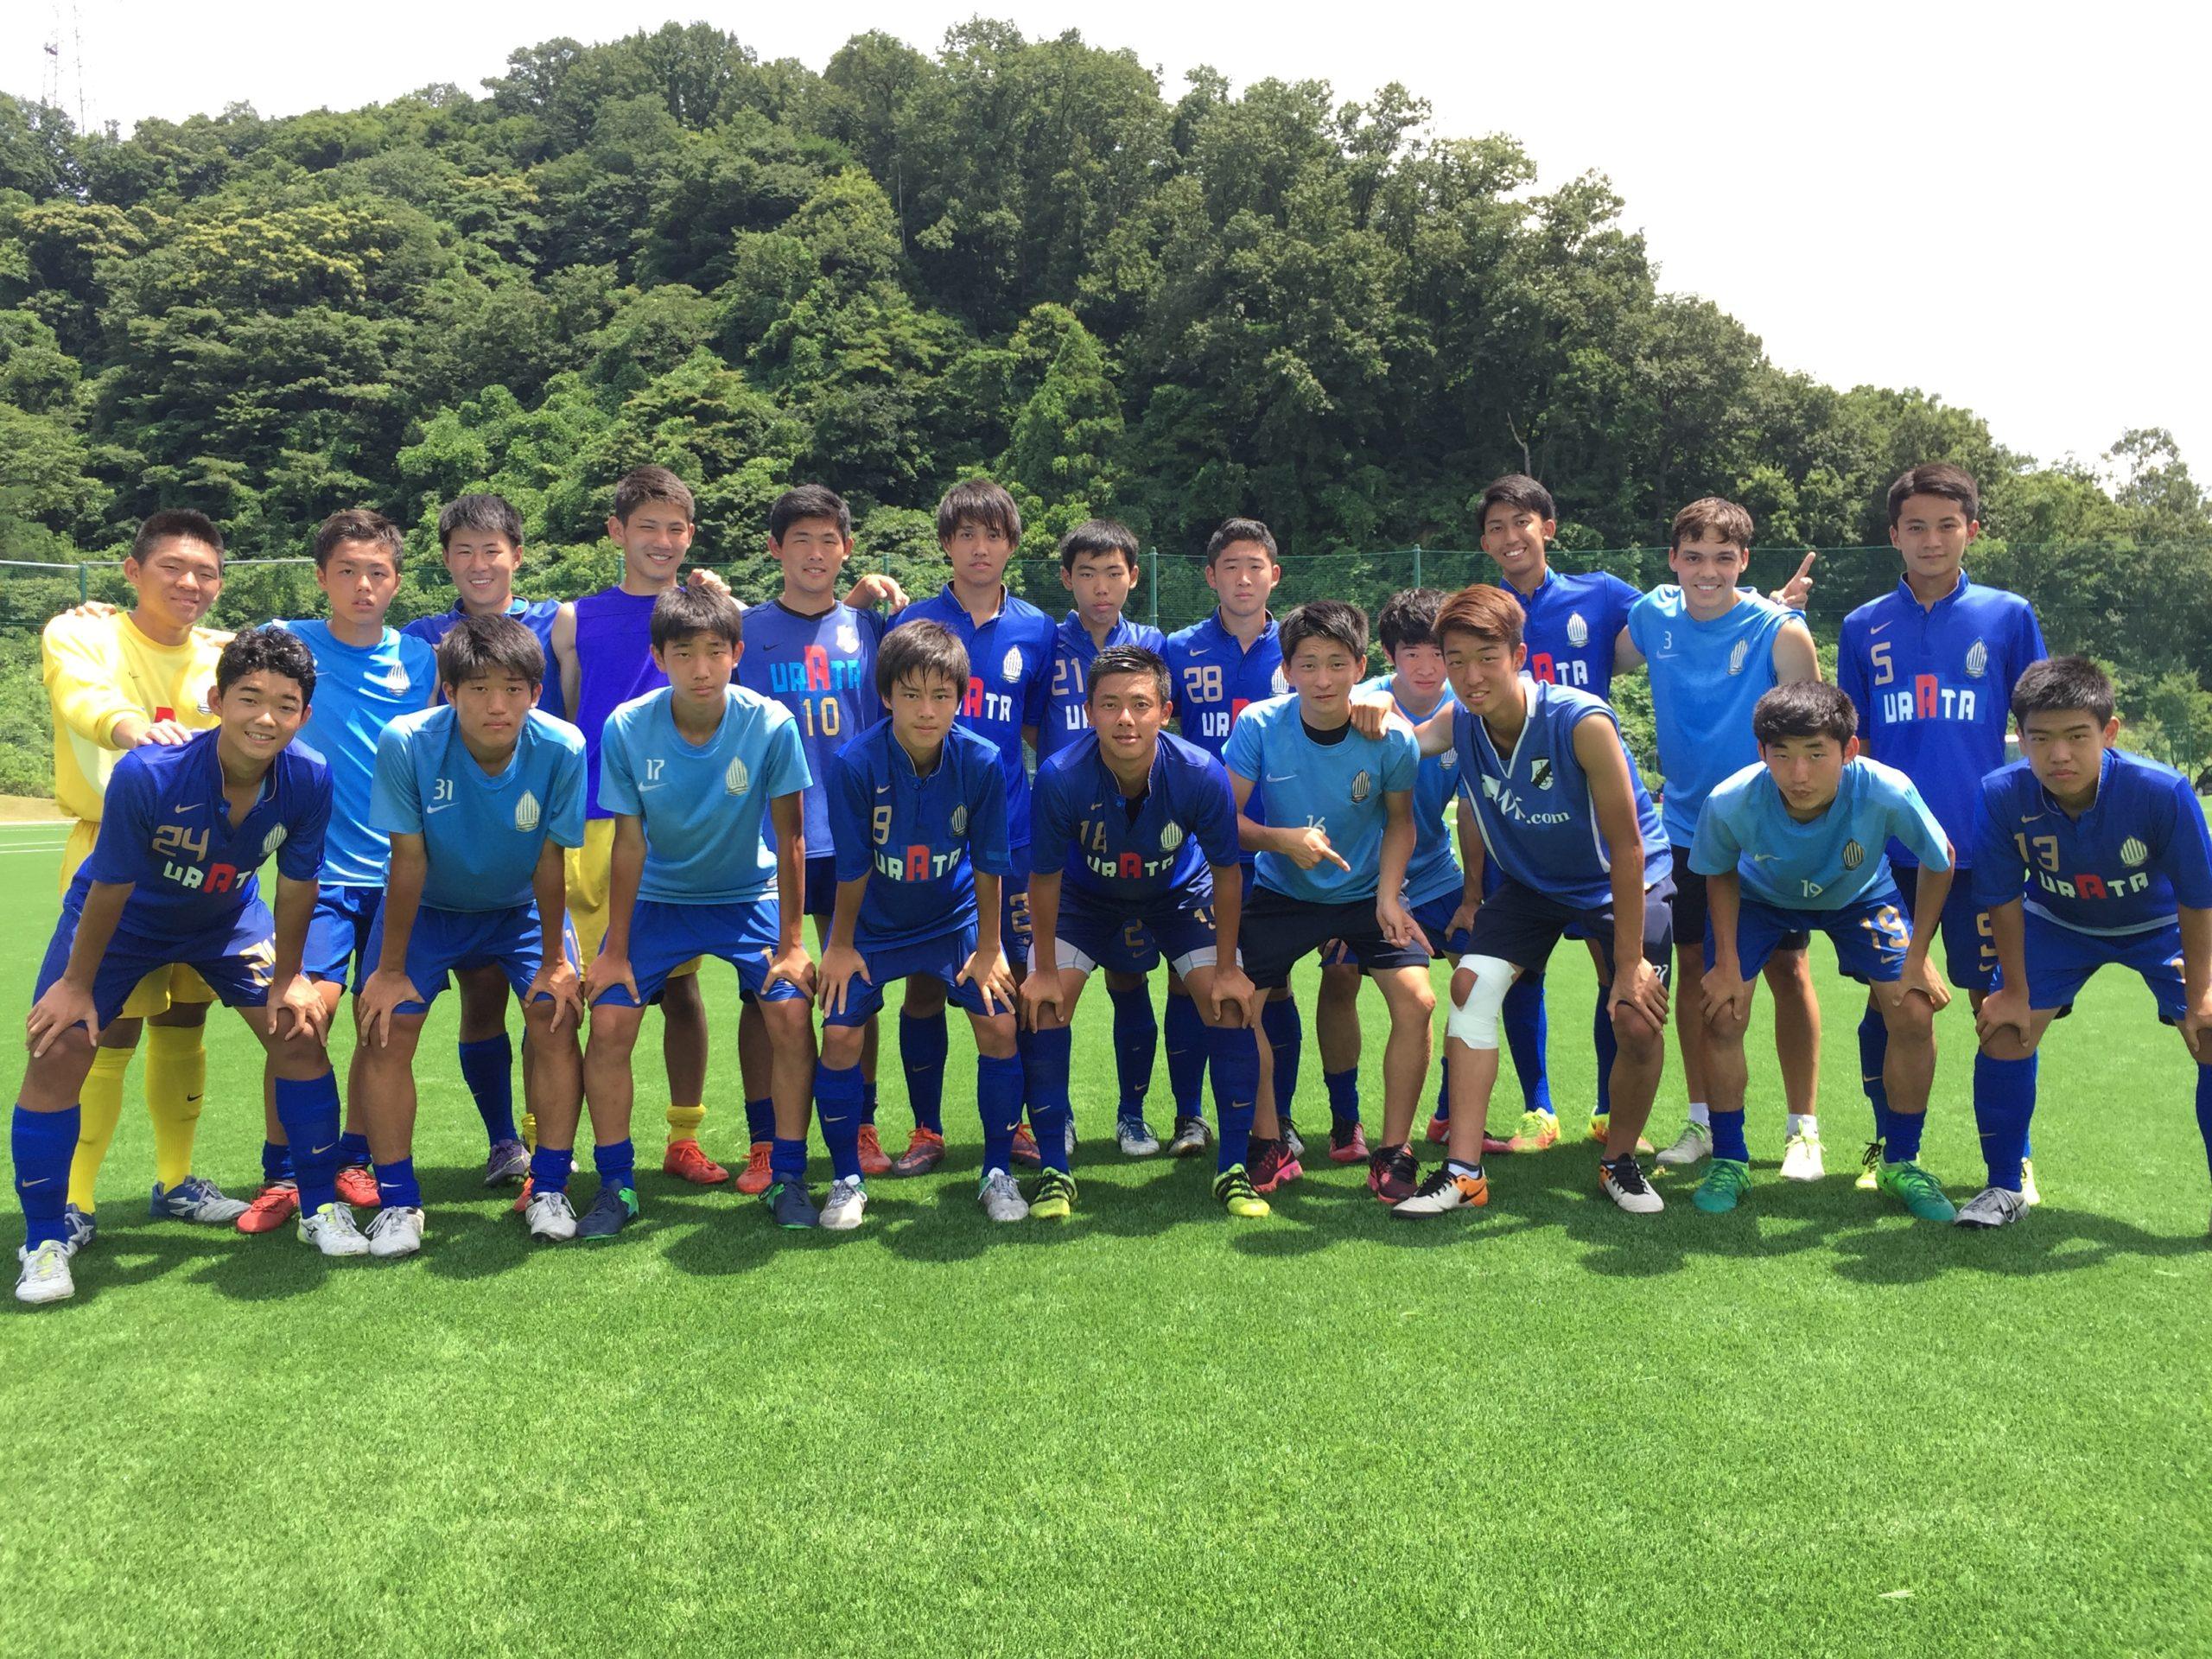 【U18】第2回金沢ユースチャレンジカップサッカー大会結果